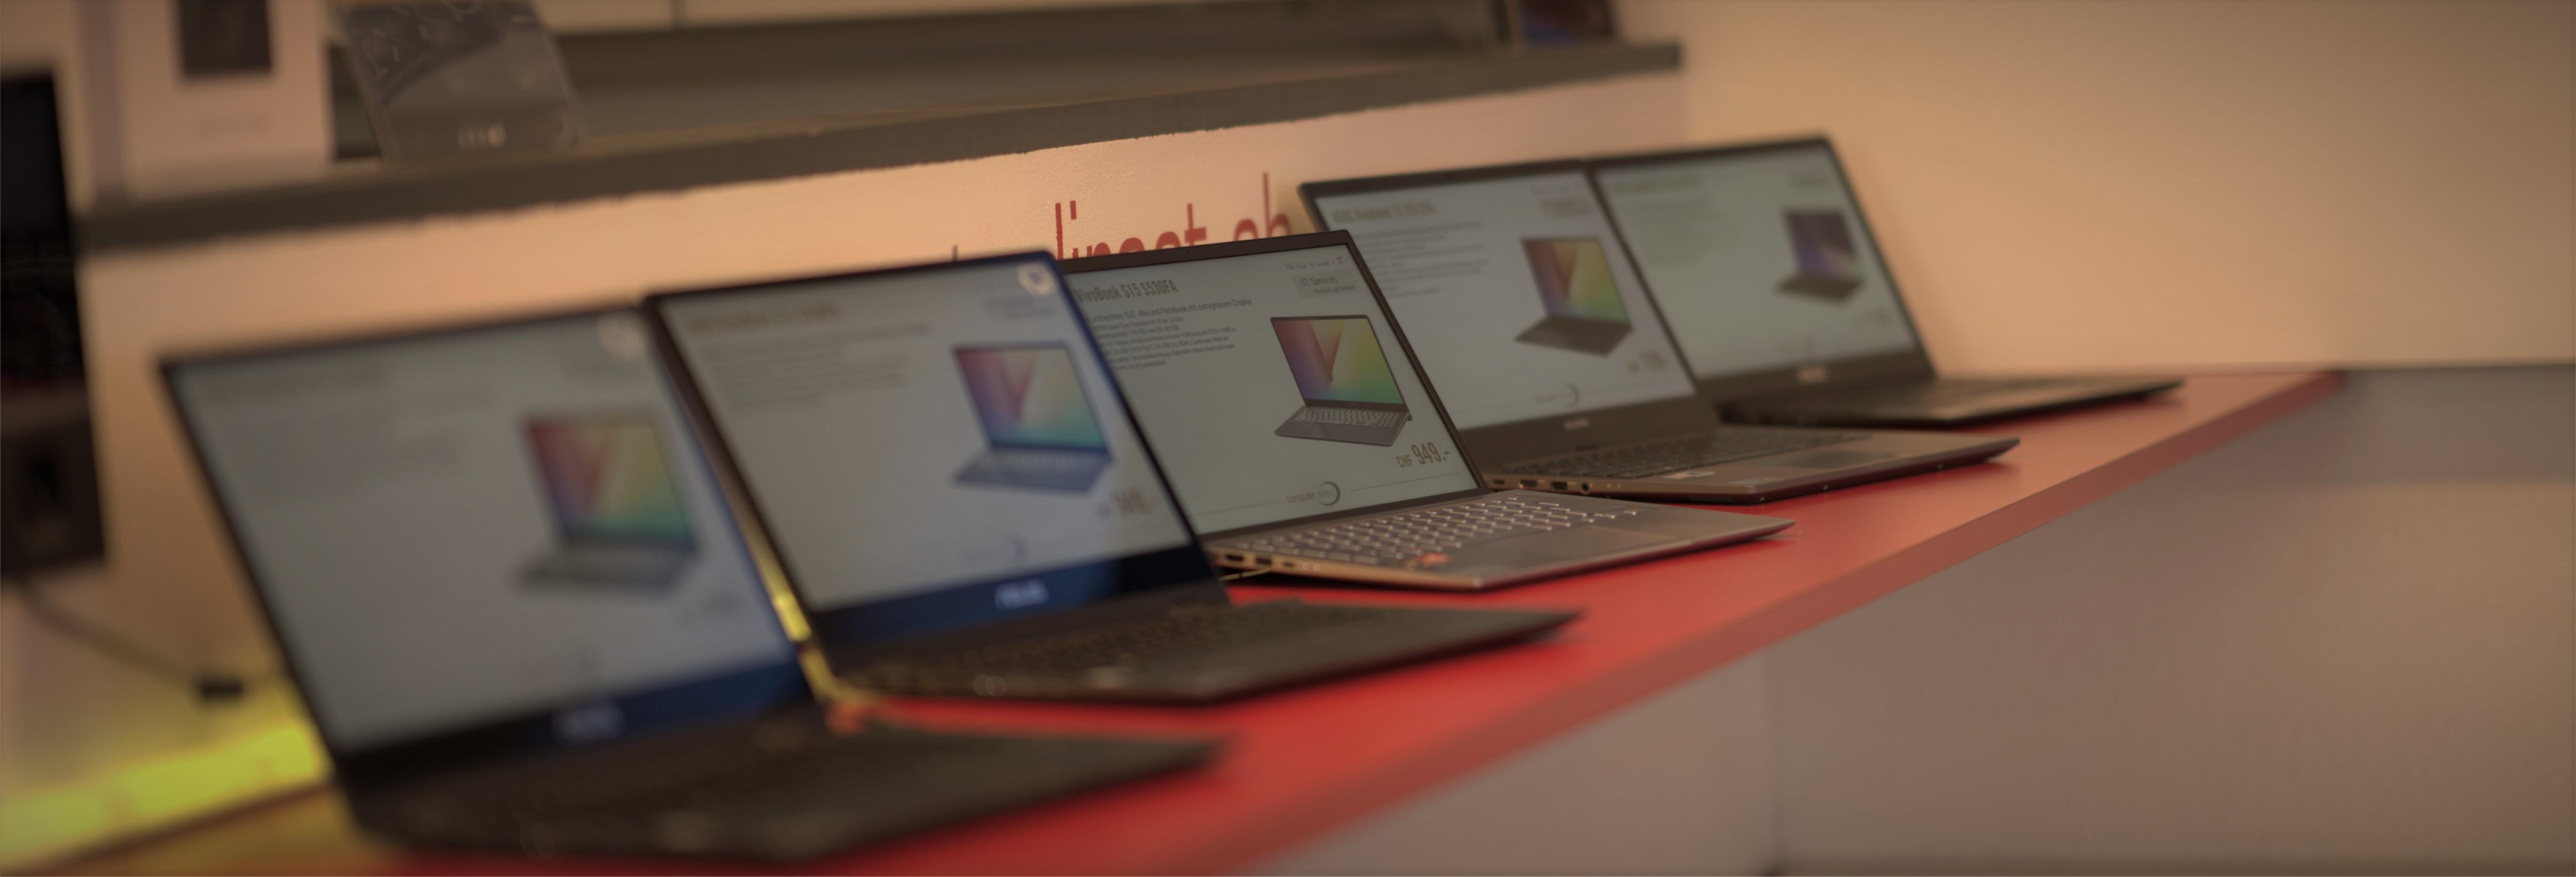 Notebook Beratung und Ausstellung Computer Direct